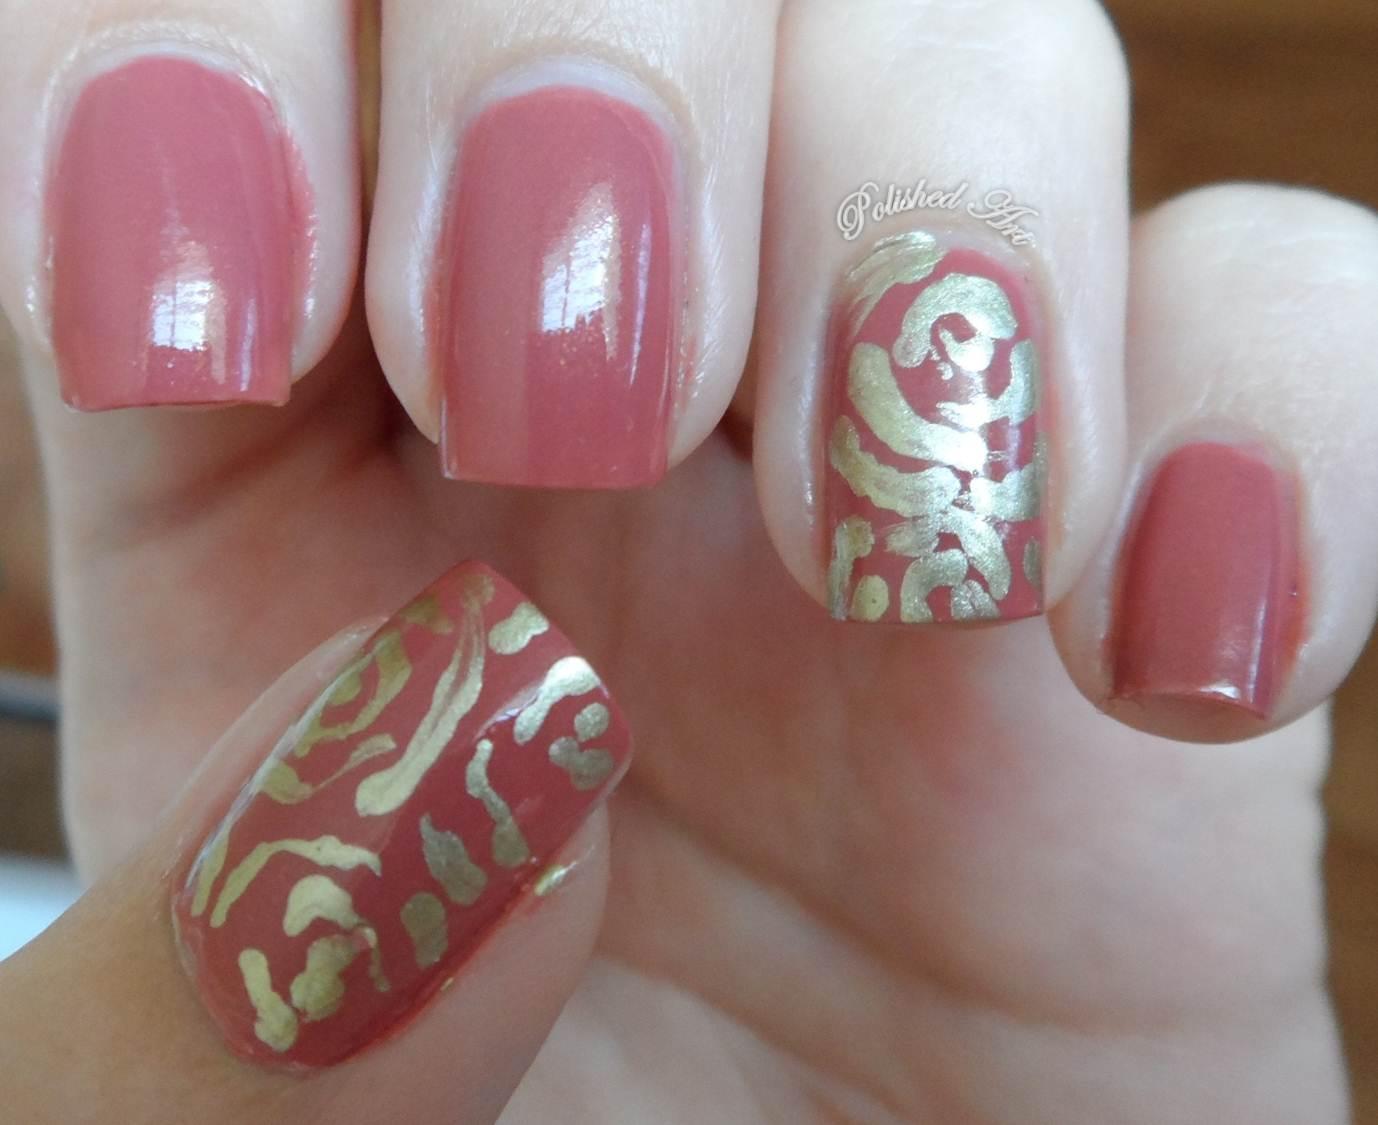 Polished Art: My Favourite Things: Favourite Nail Polish